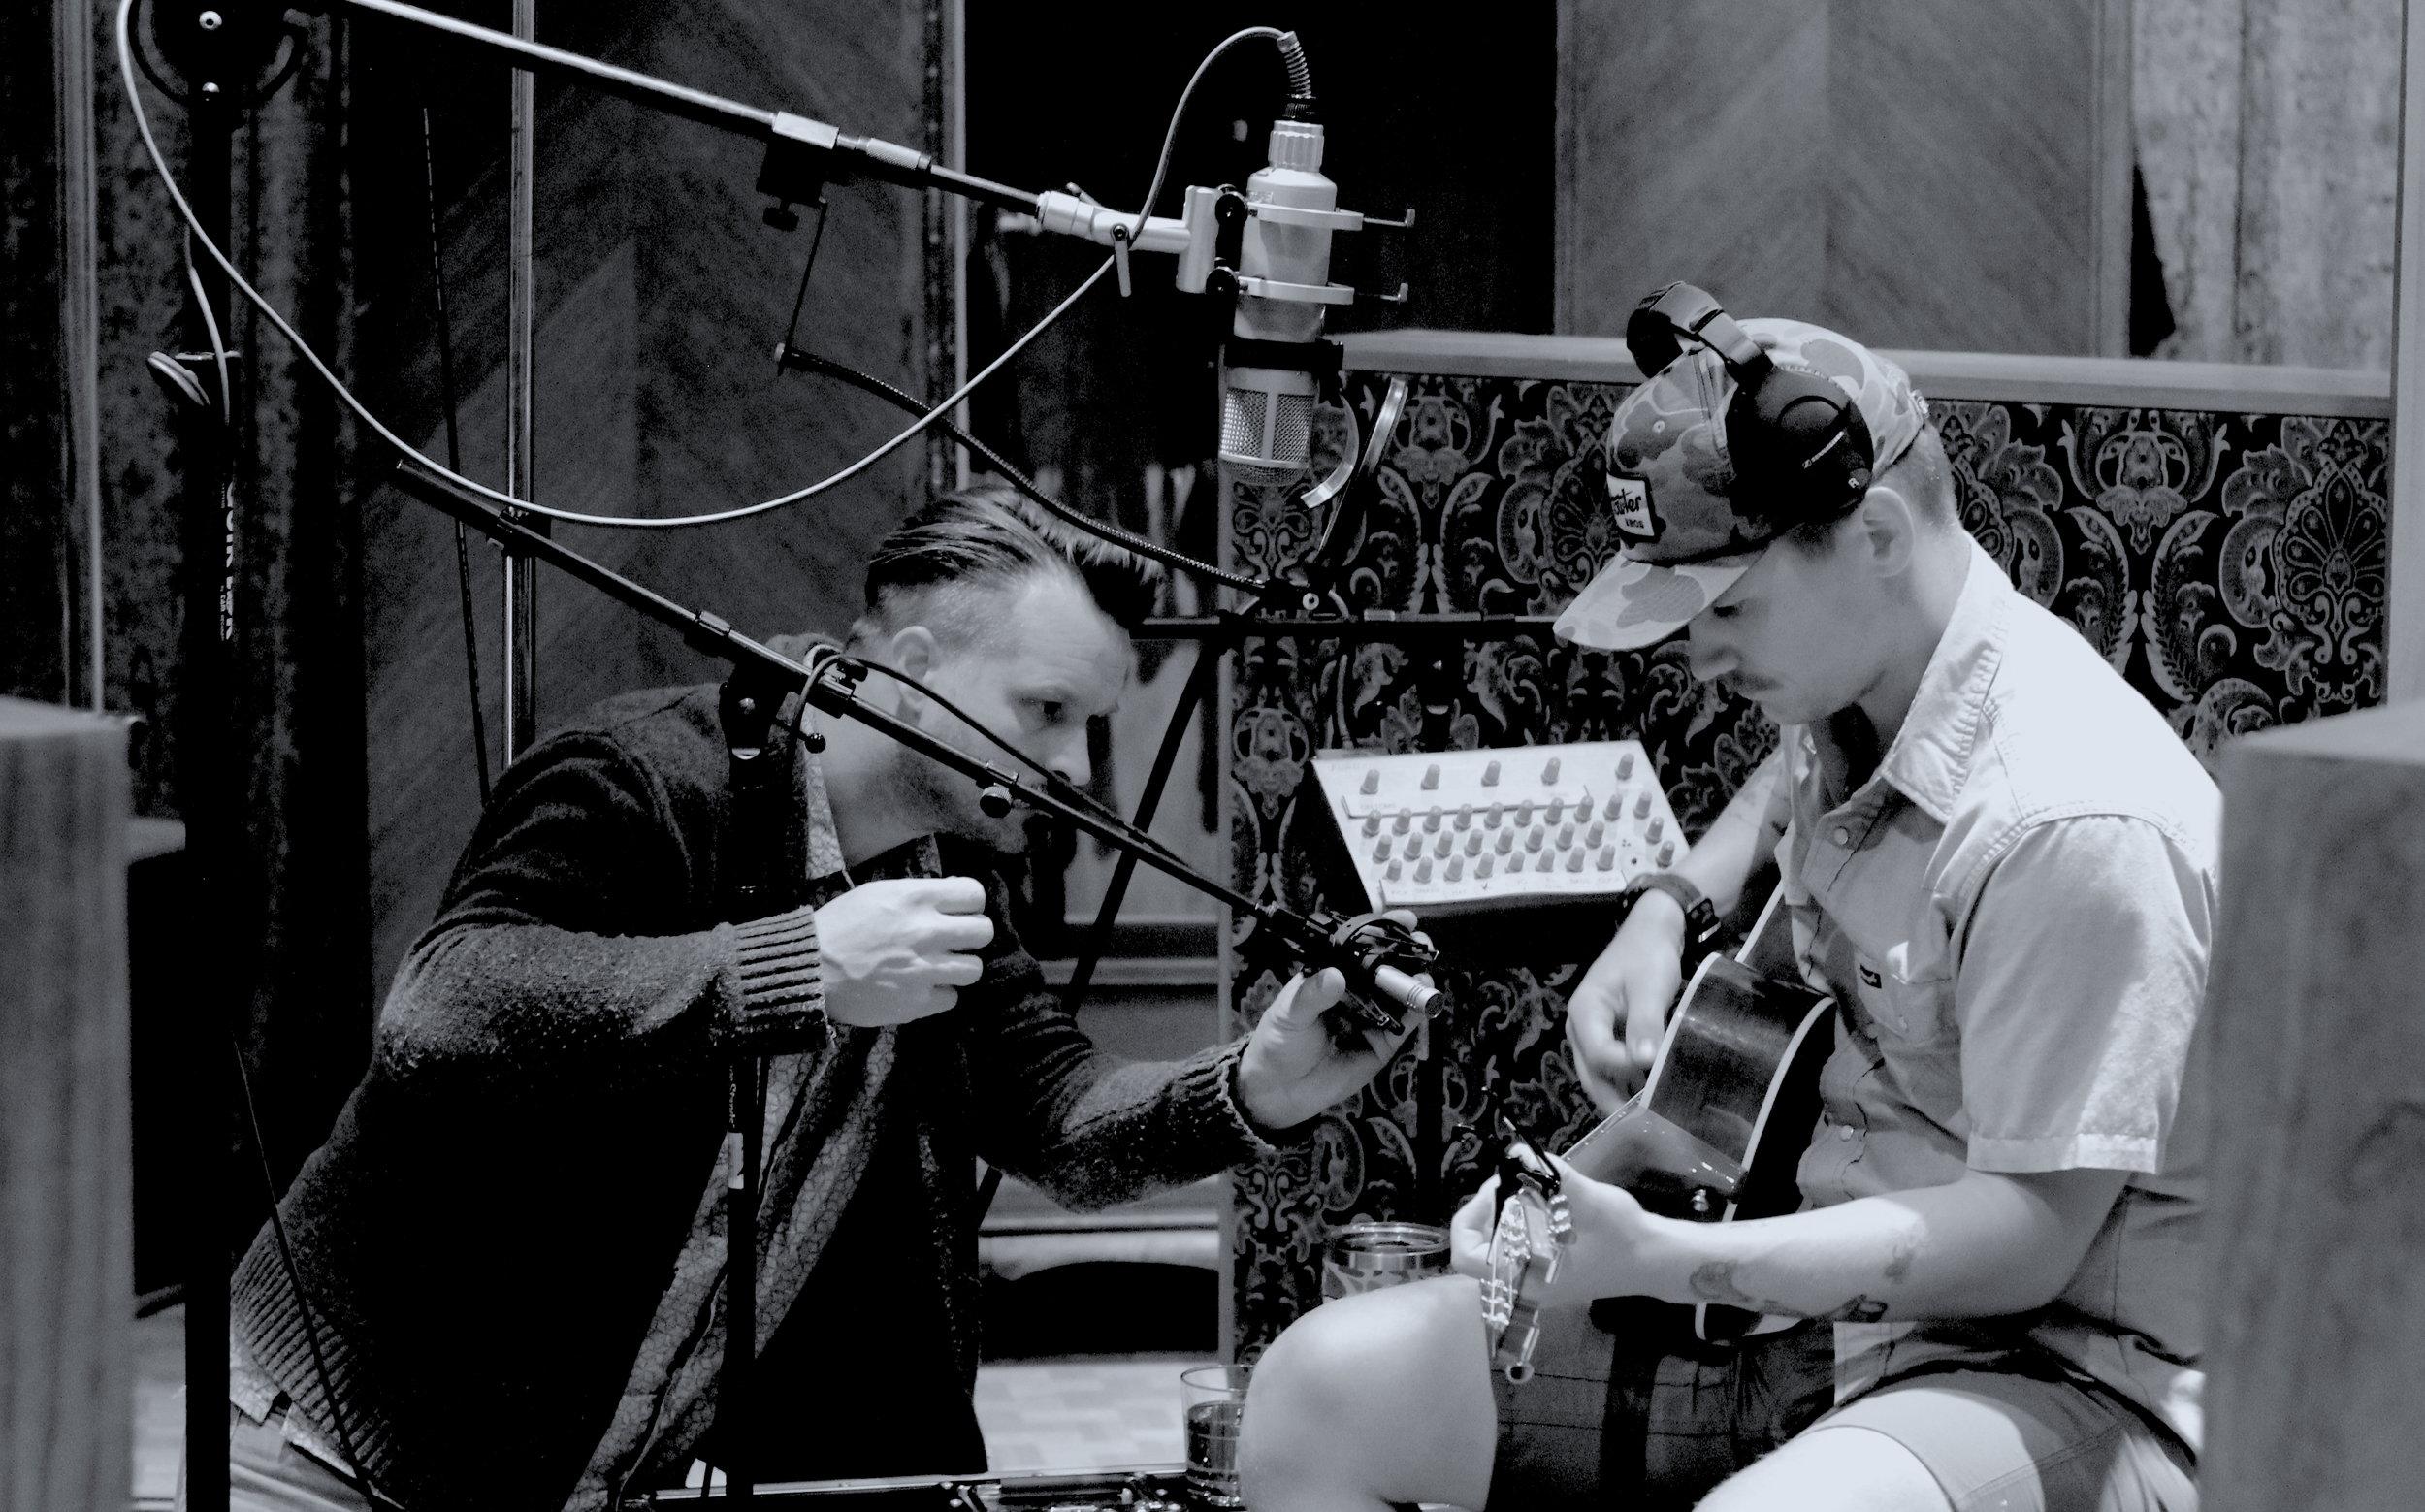 ace-kolton-acoustic-warmup.JPG